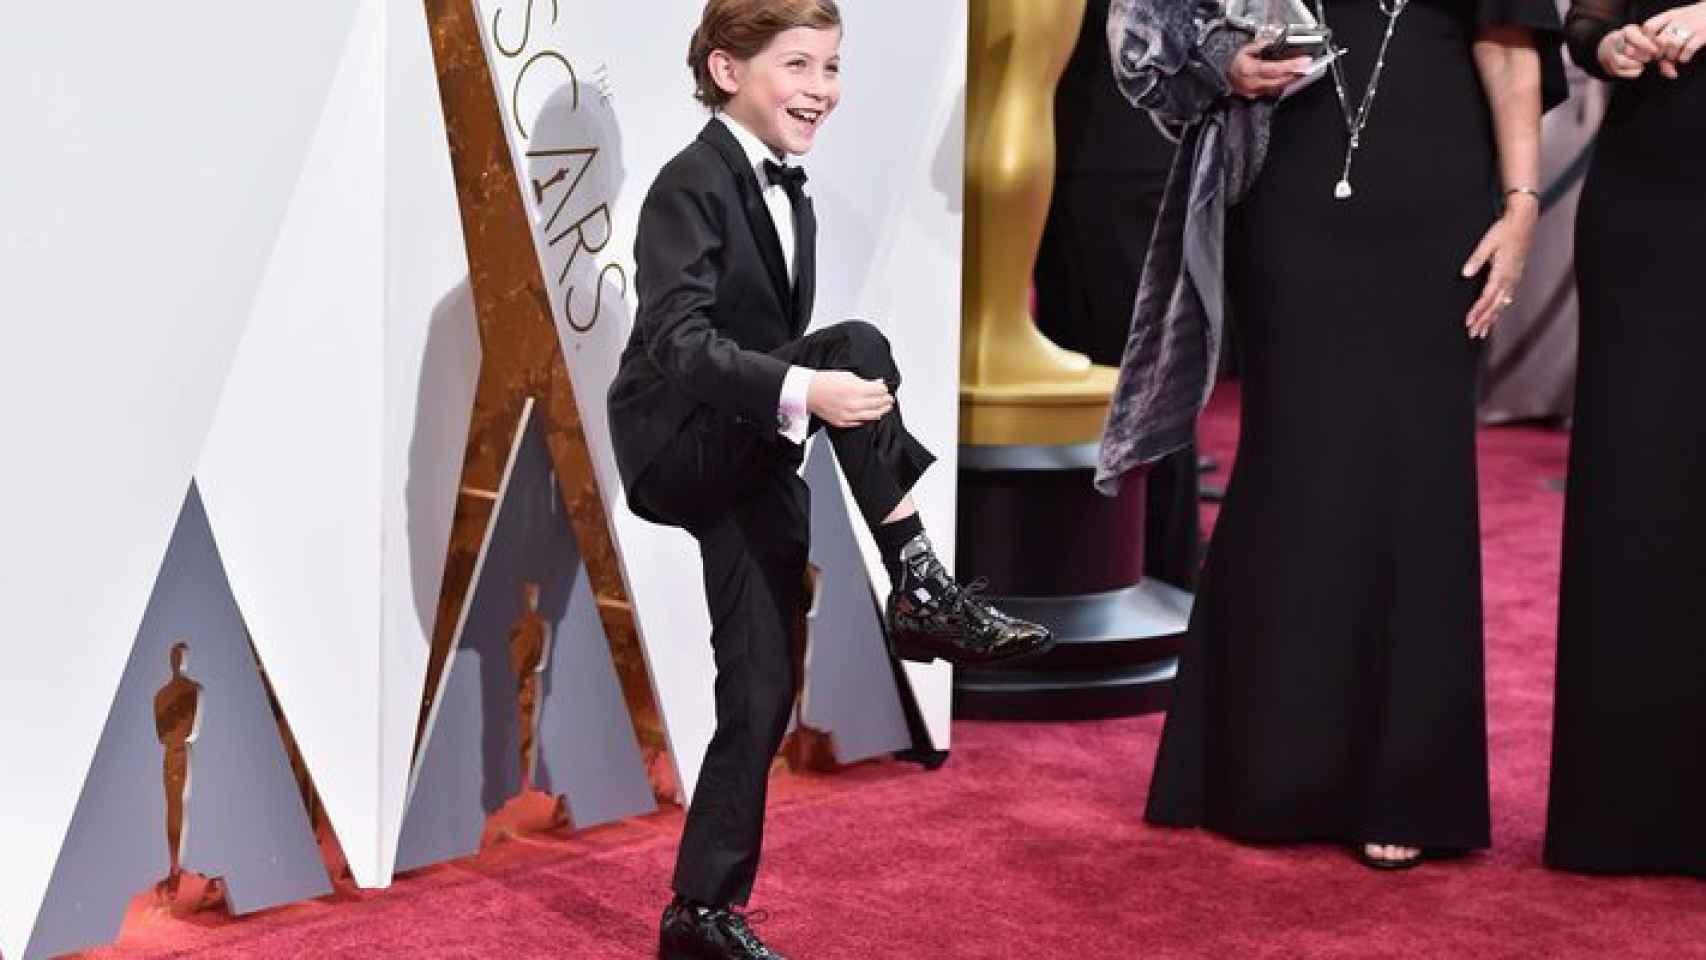 Jacob Tremblay muestra orgulloso sus calcetines de Darth Vader